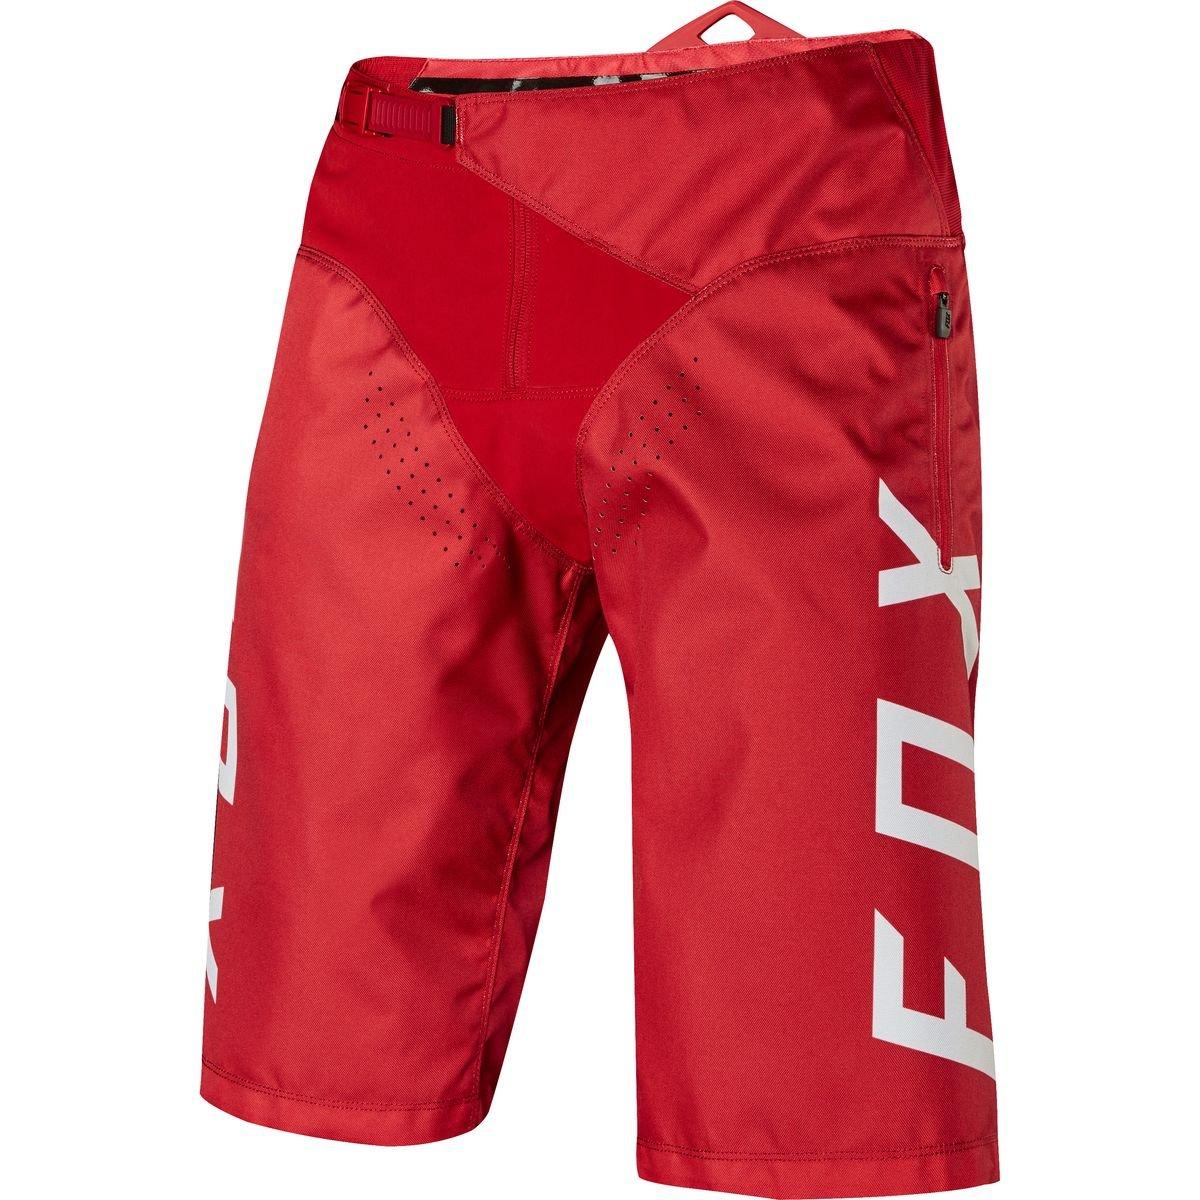 Fox Racing Demo DH Short - Men's Bright Red, 34